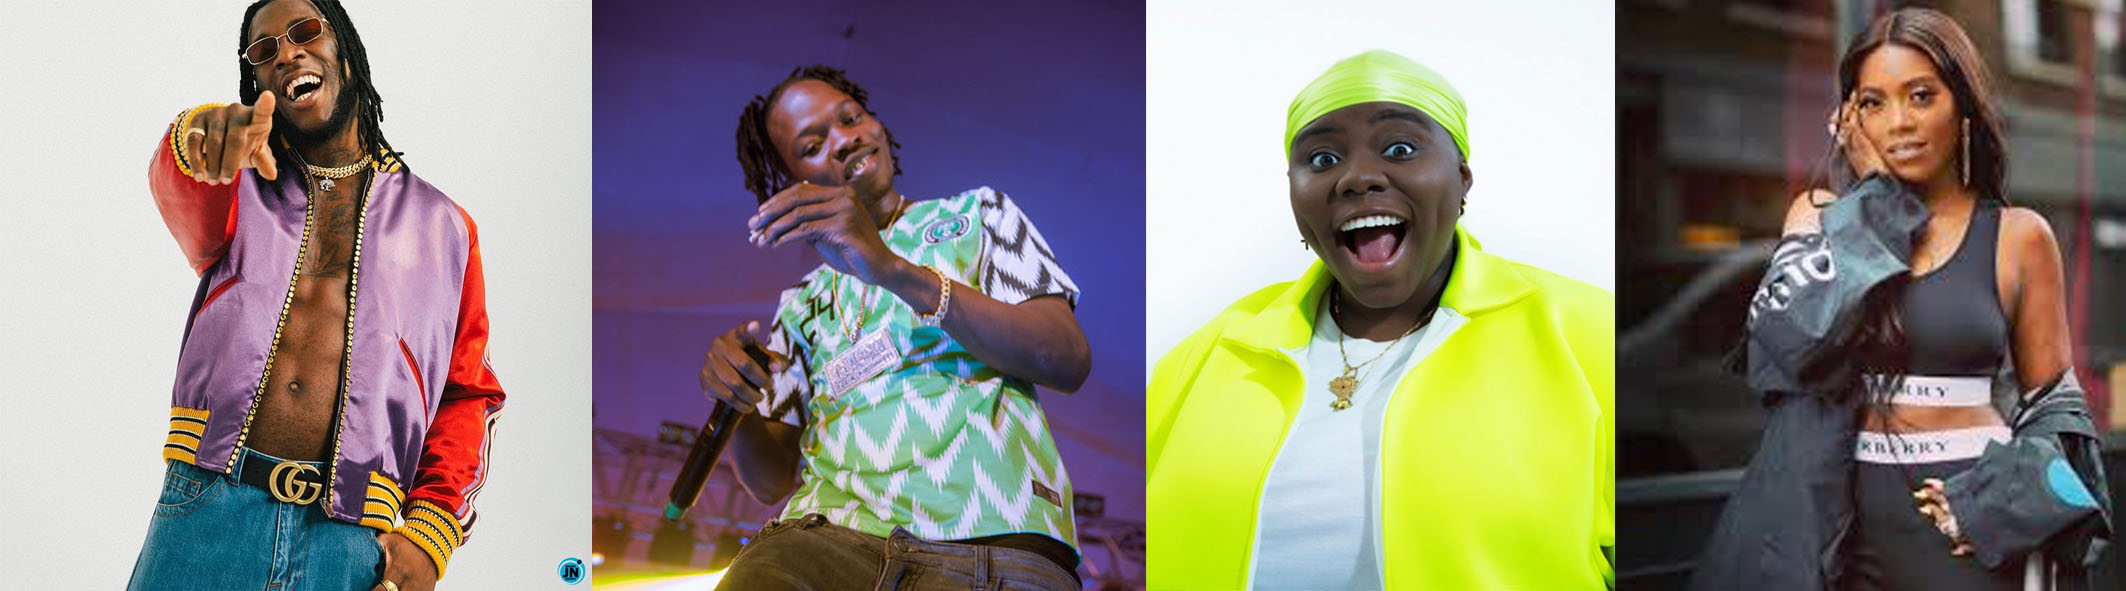 Burna Boy, Tiwa Savage, Naira Marley, Teni, Others To Perform At BAFEST 2019!